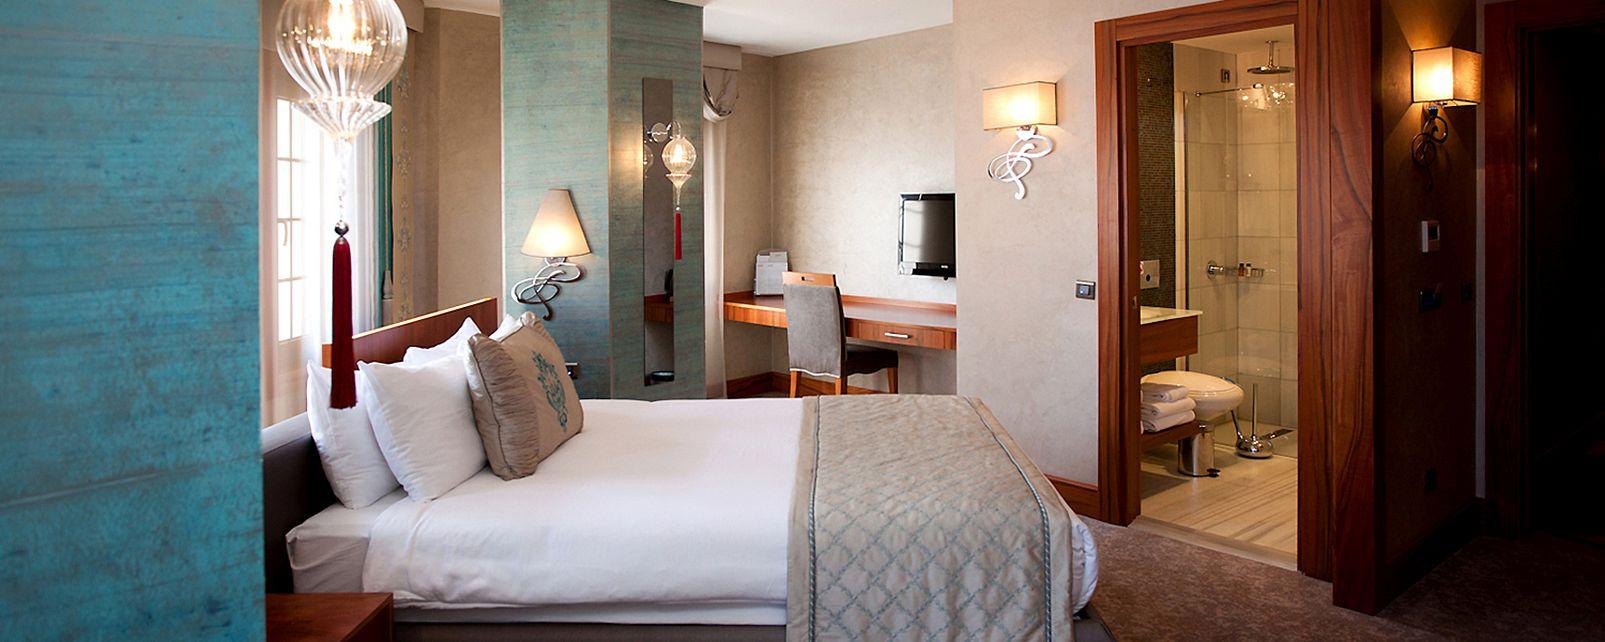 Hôtel Biz Cevahir Hotel Sultanahmet